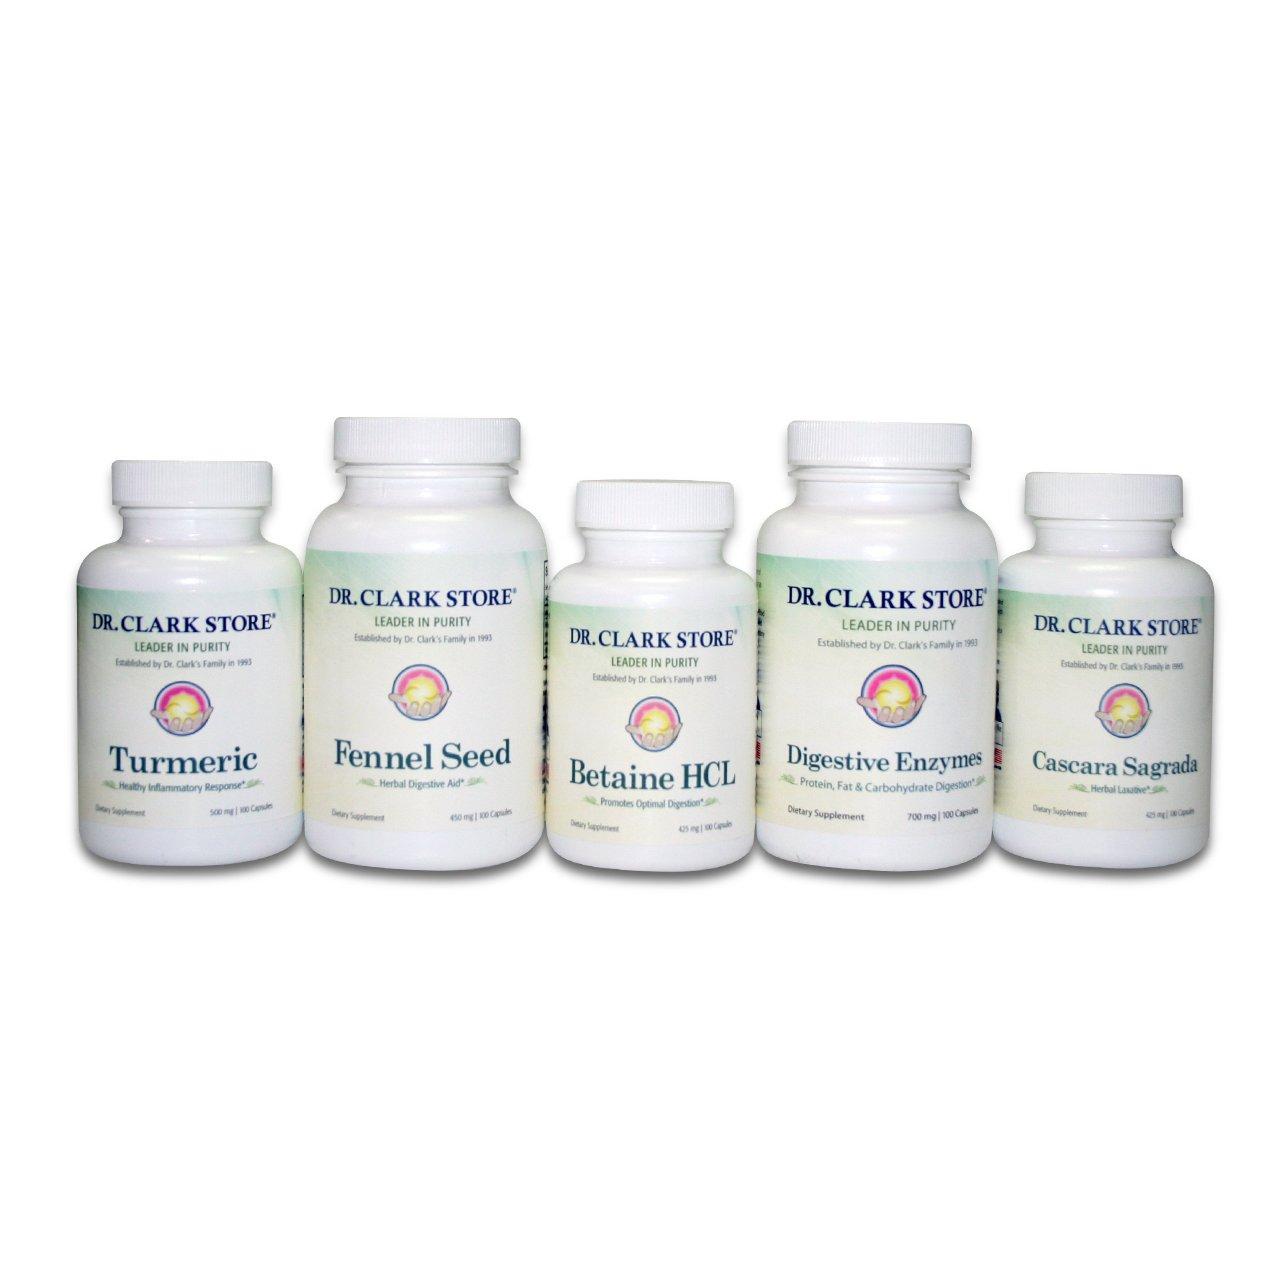 Amazon.com: Dr. Clark Digestive Aid Cleanse - Digestive Detox - Colon  Cleanse: Health & Personal Care